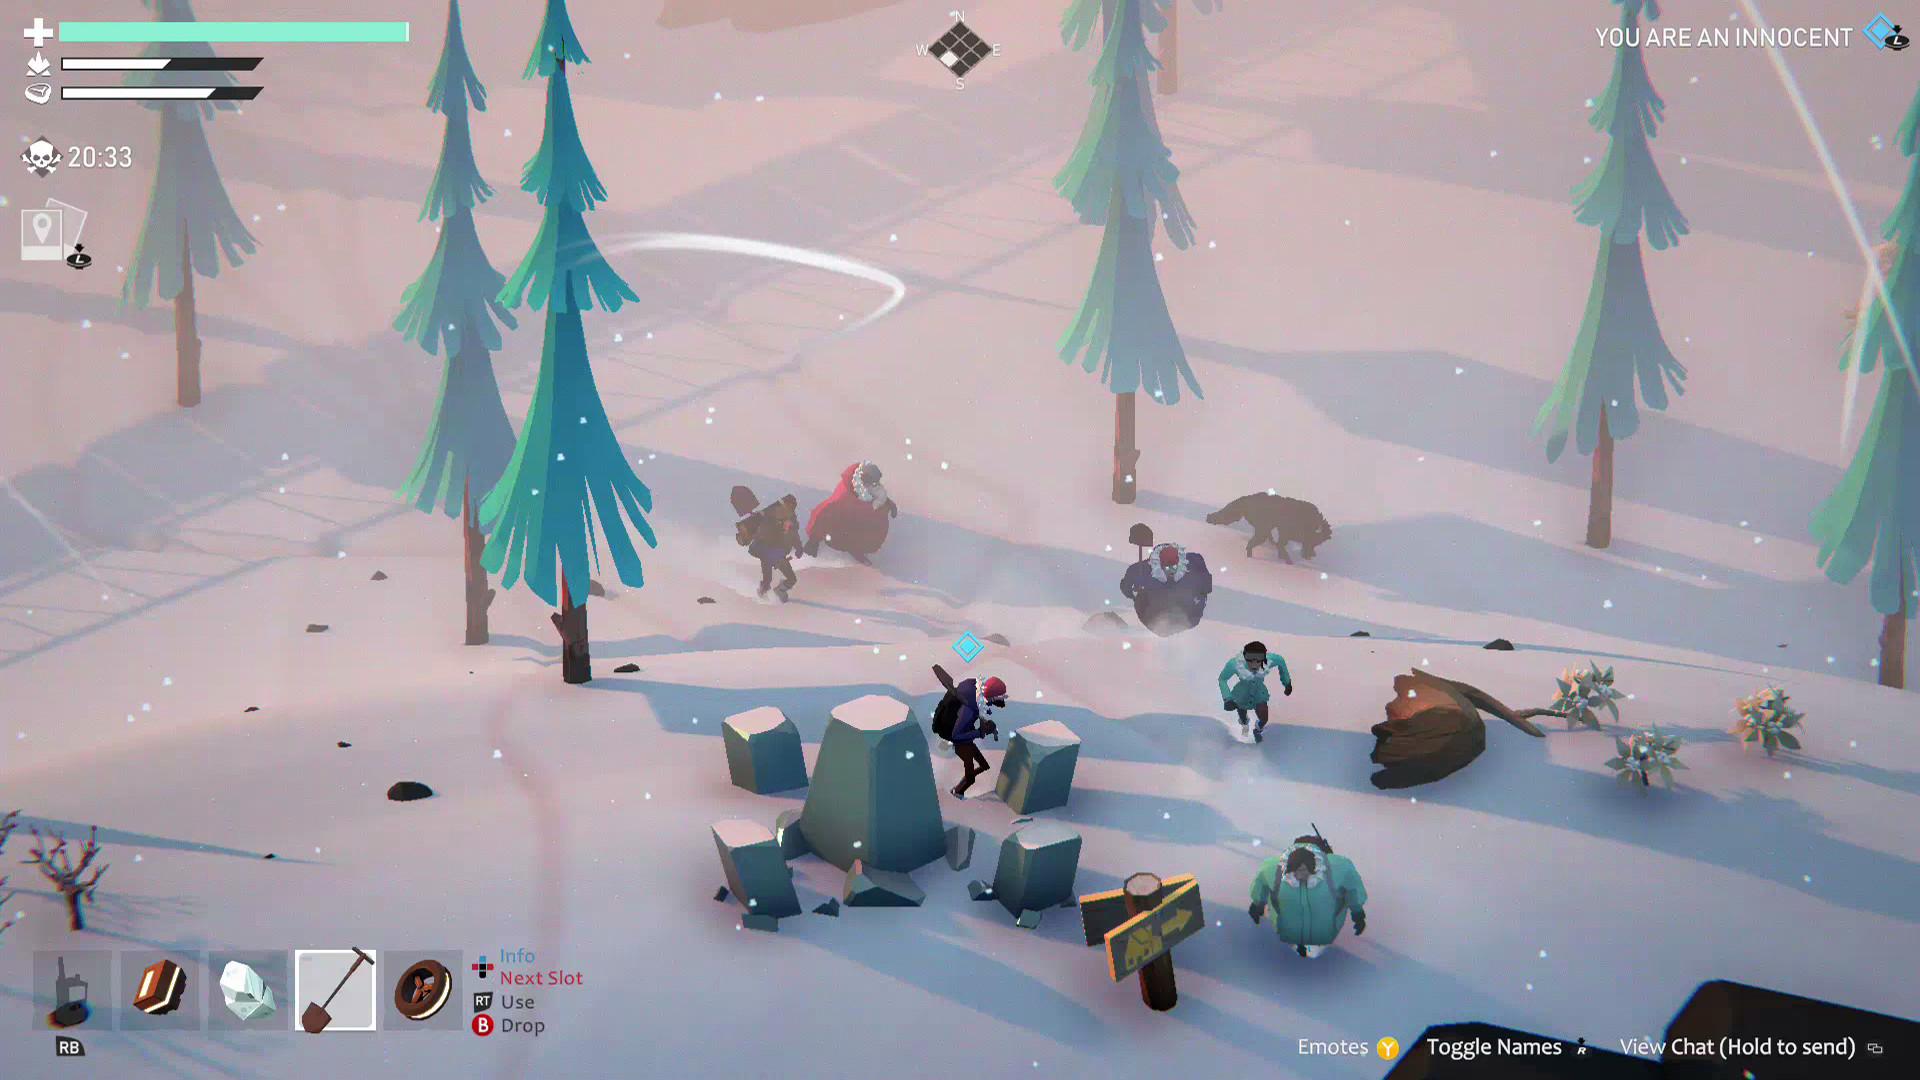 Project Winter 2 - دانلود بازی آنلاین Project Winter برای کامپیوتر